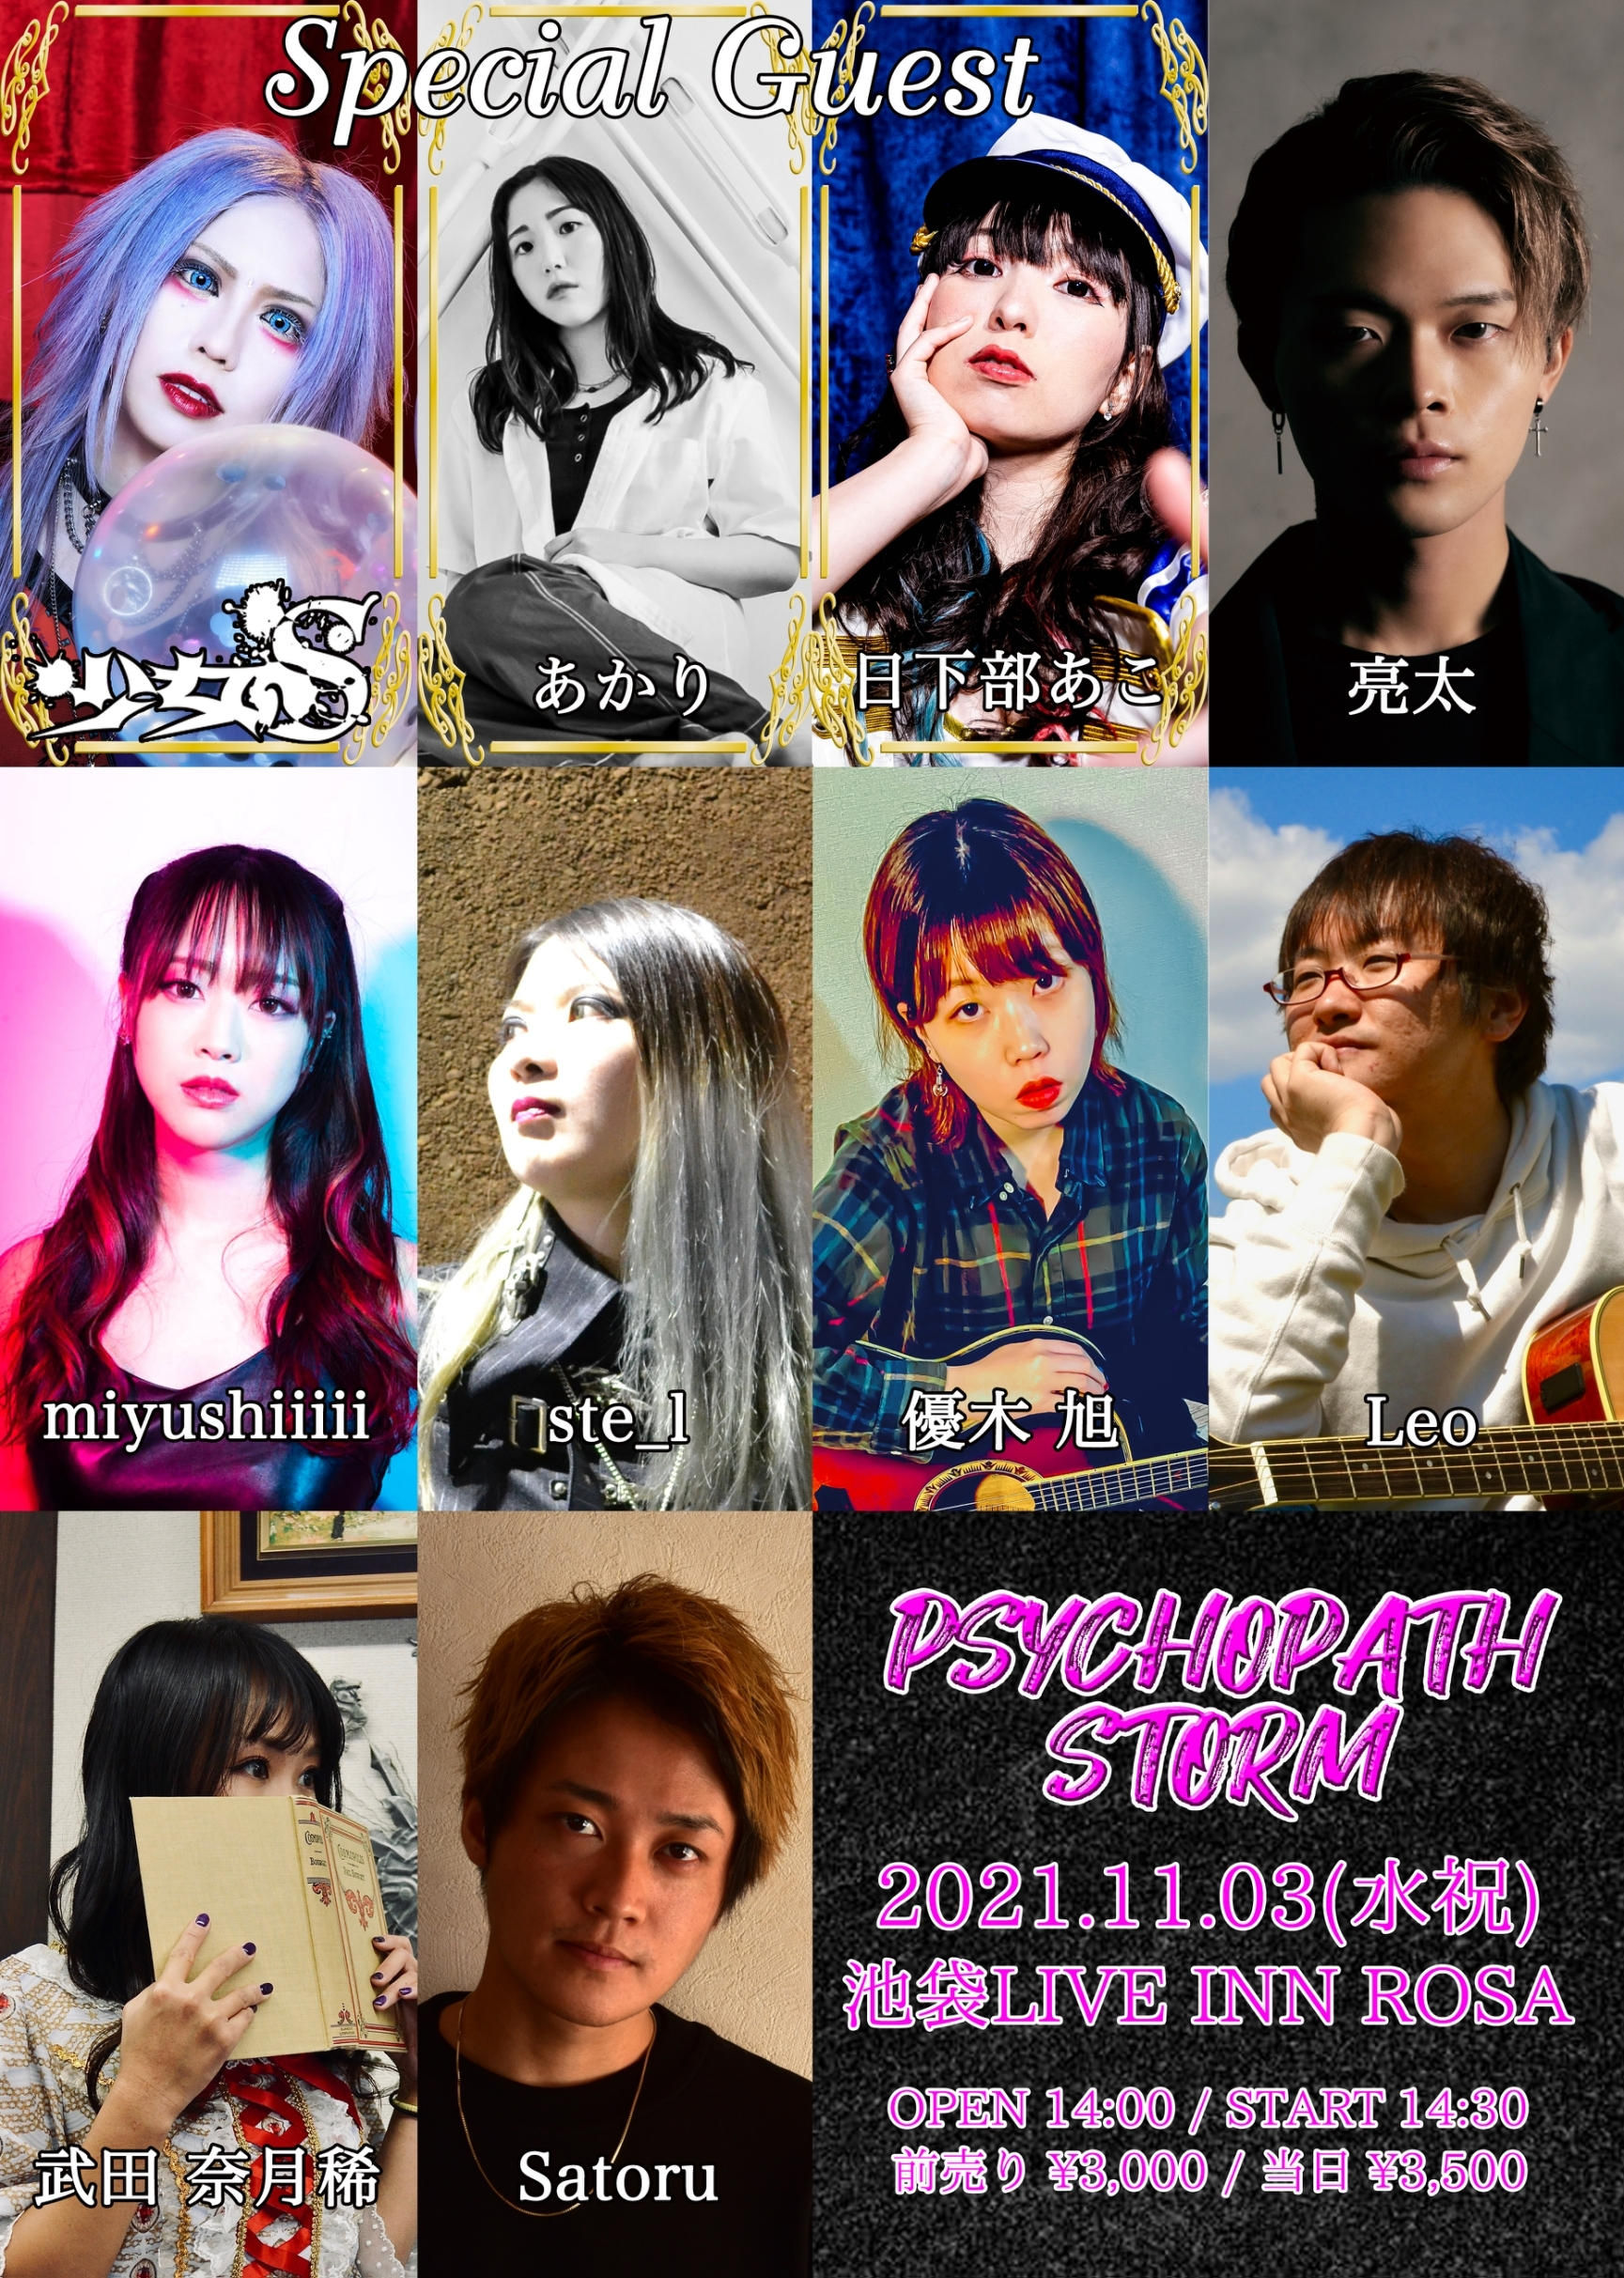 2021.11.3(水・祝)池袋LIVE INN ROSA